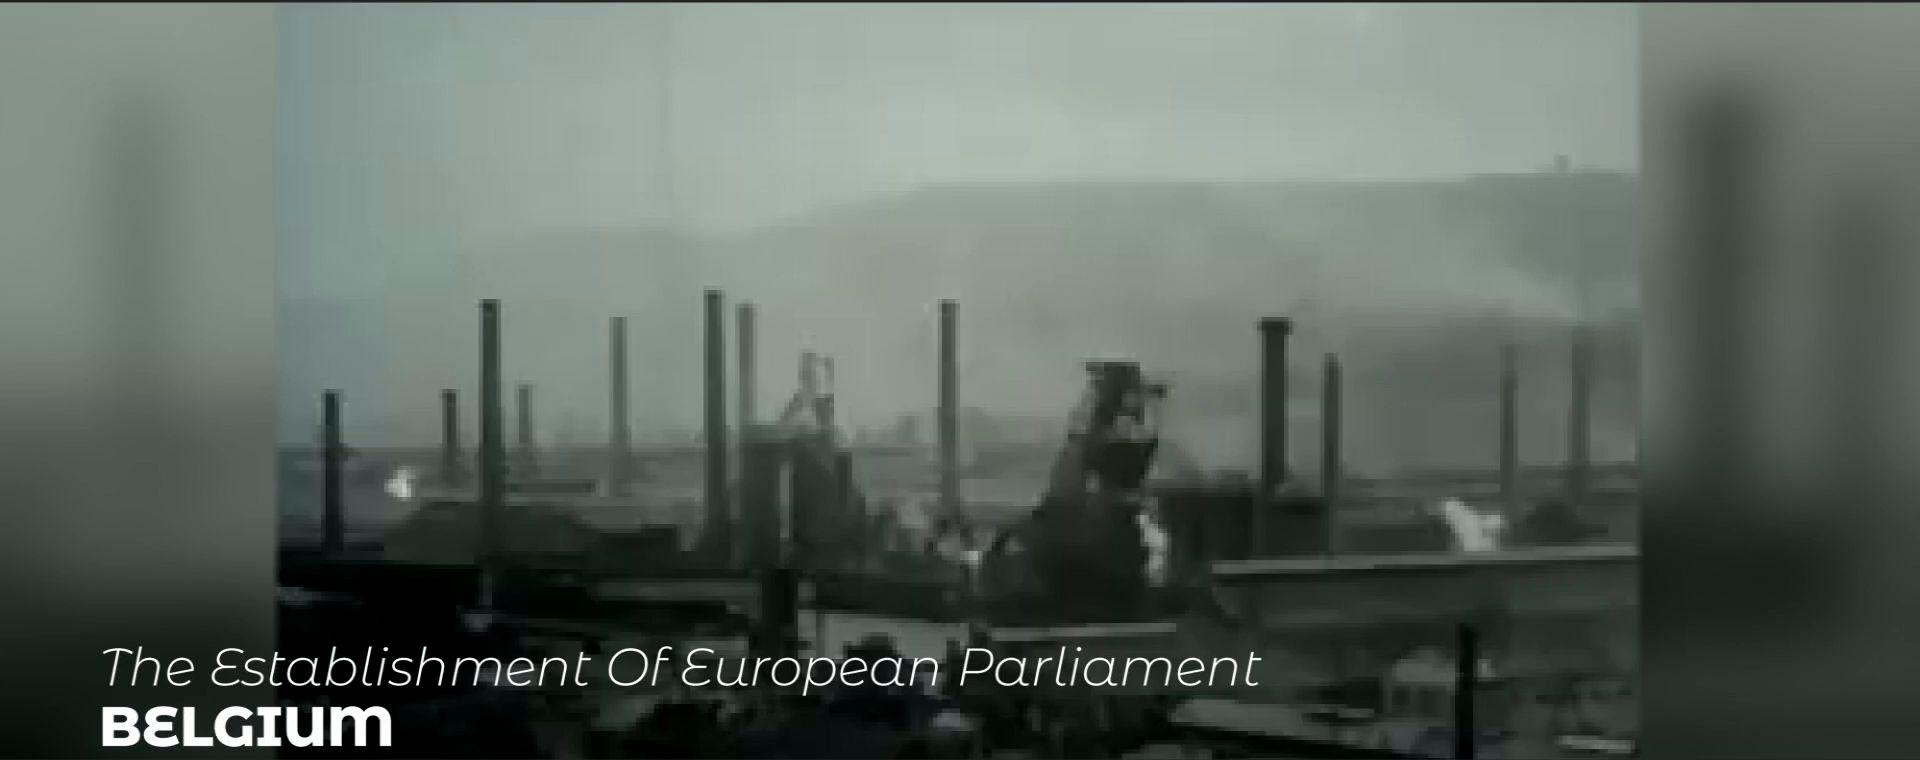 THE ESTABLISHMENT OF EUROPEAN PARLIAMENT